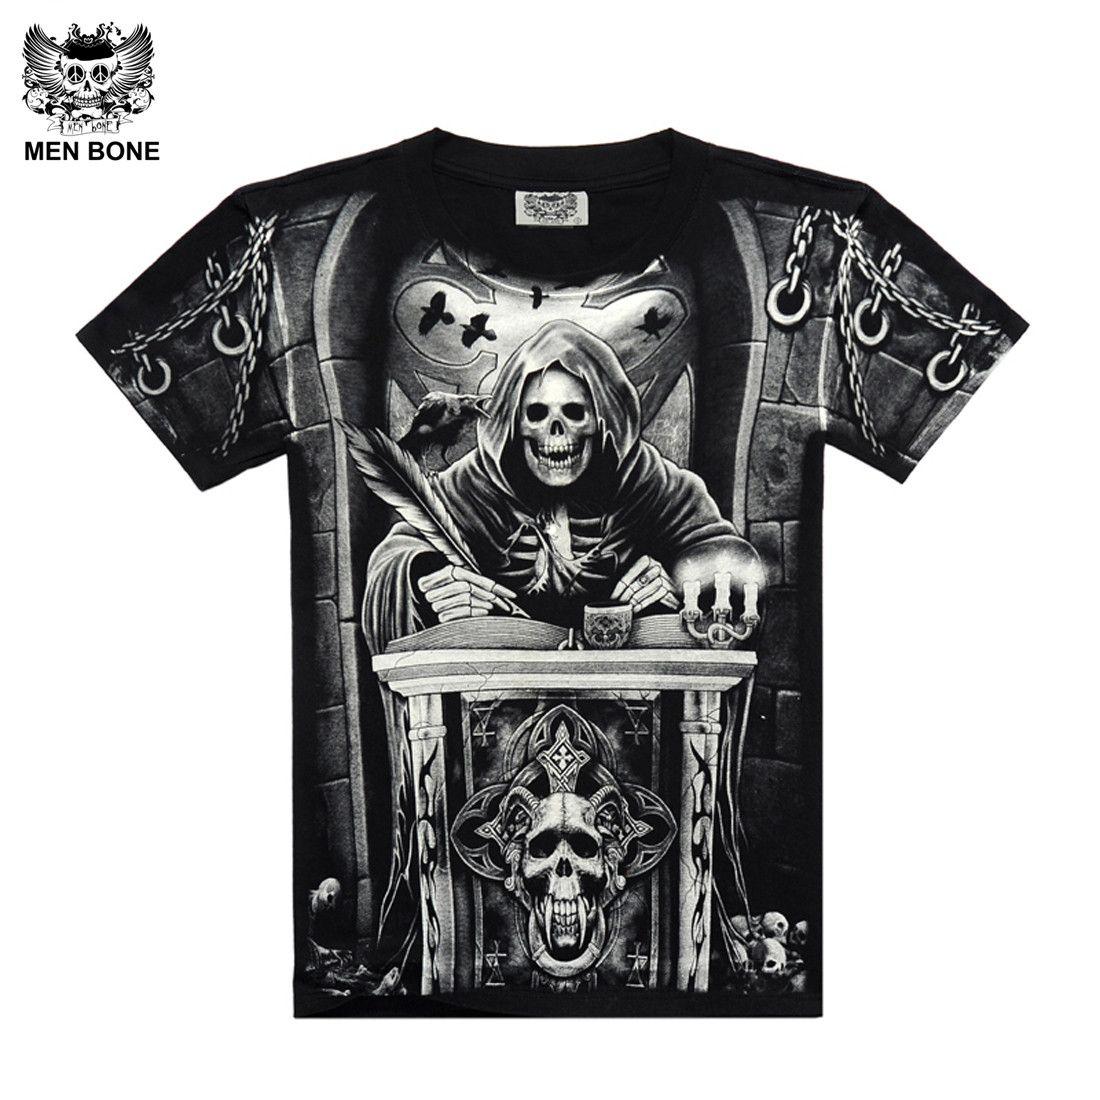 [Men bone] Heavy Metal Style grim Reaper skull Tshirt black Black Print shirt Hip Hop street rock heavy metal sleeve